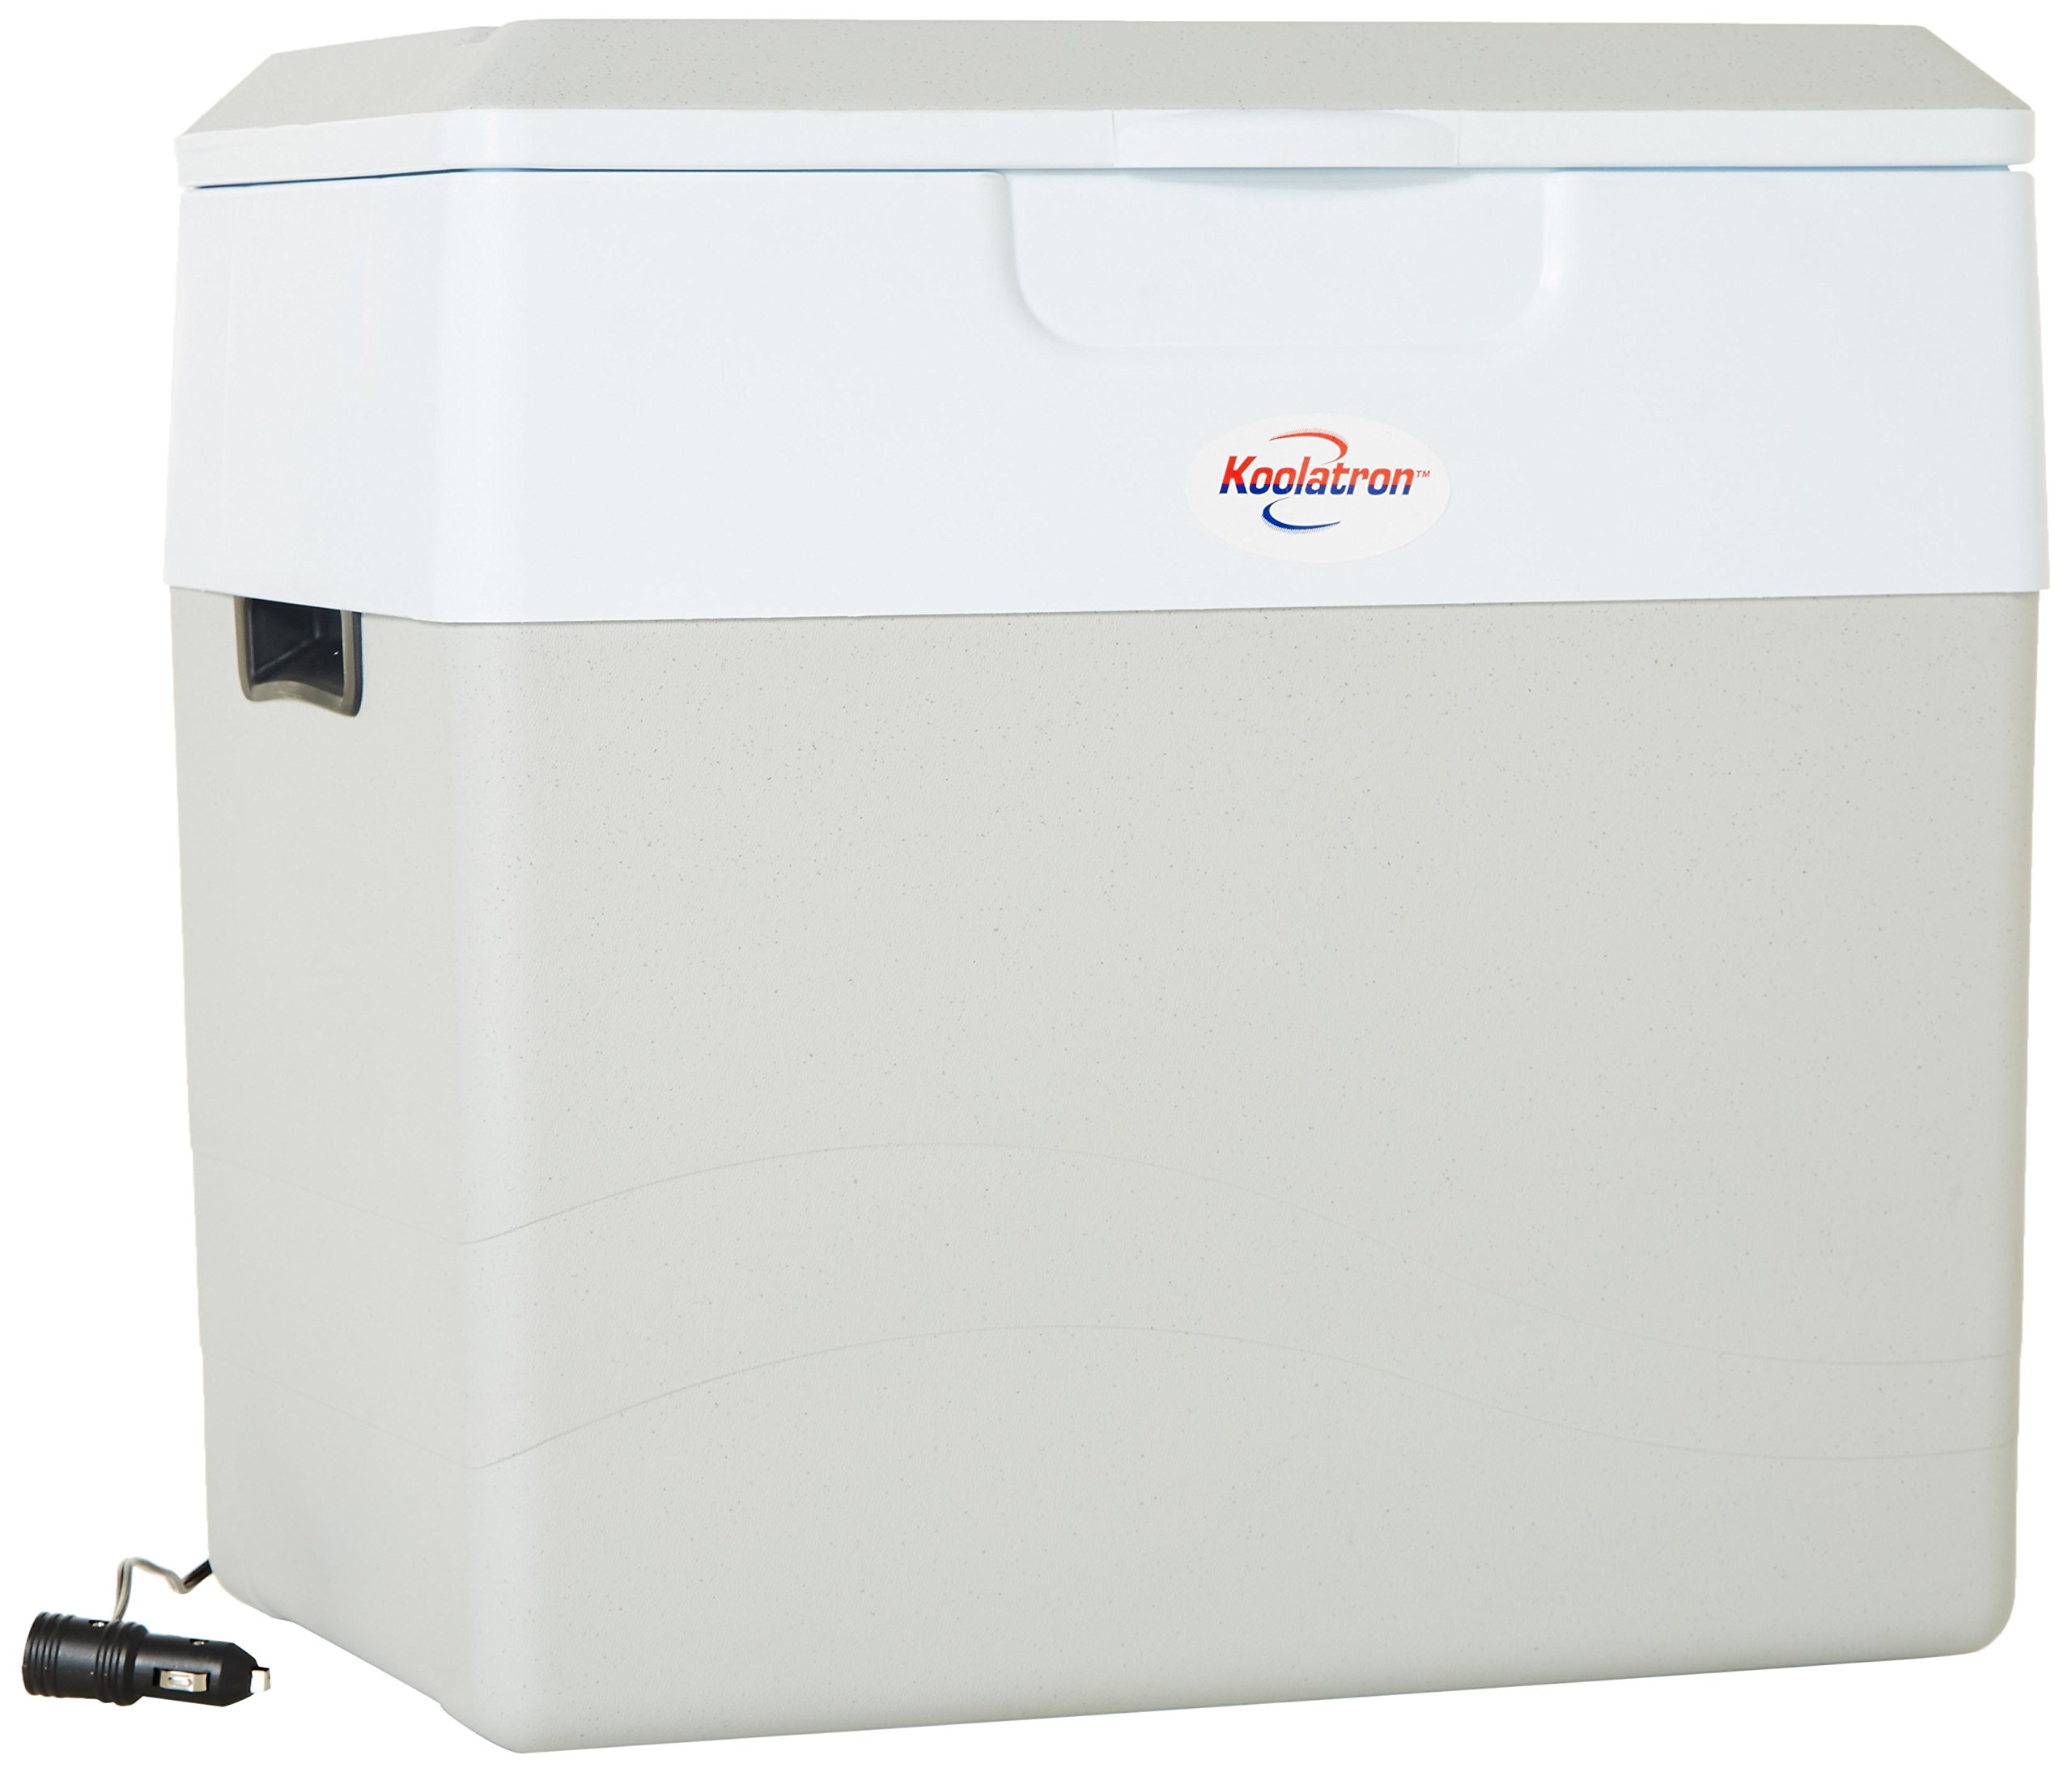 Koolatron 52-Quart Krusader Cooler (P85) by Koolatron